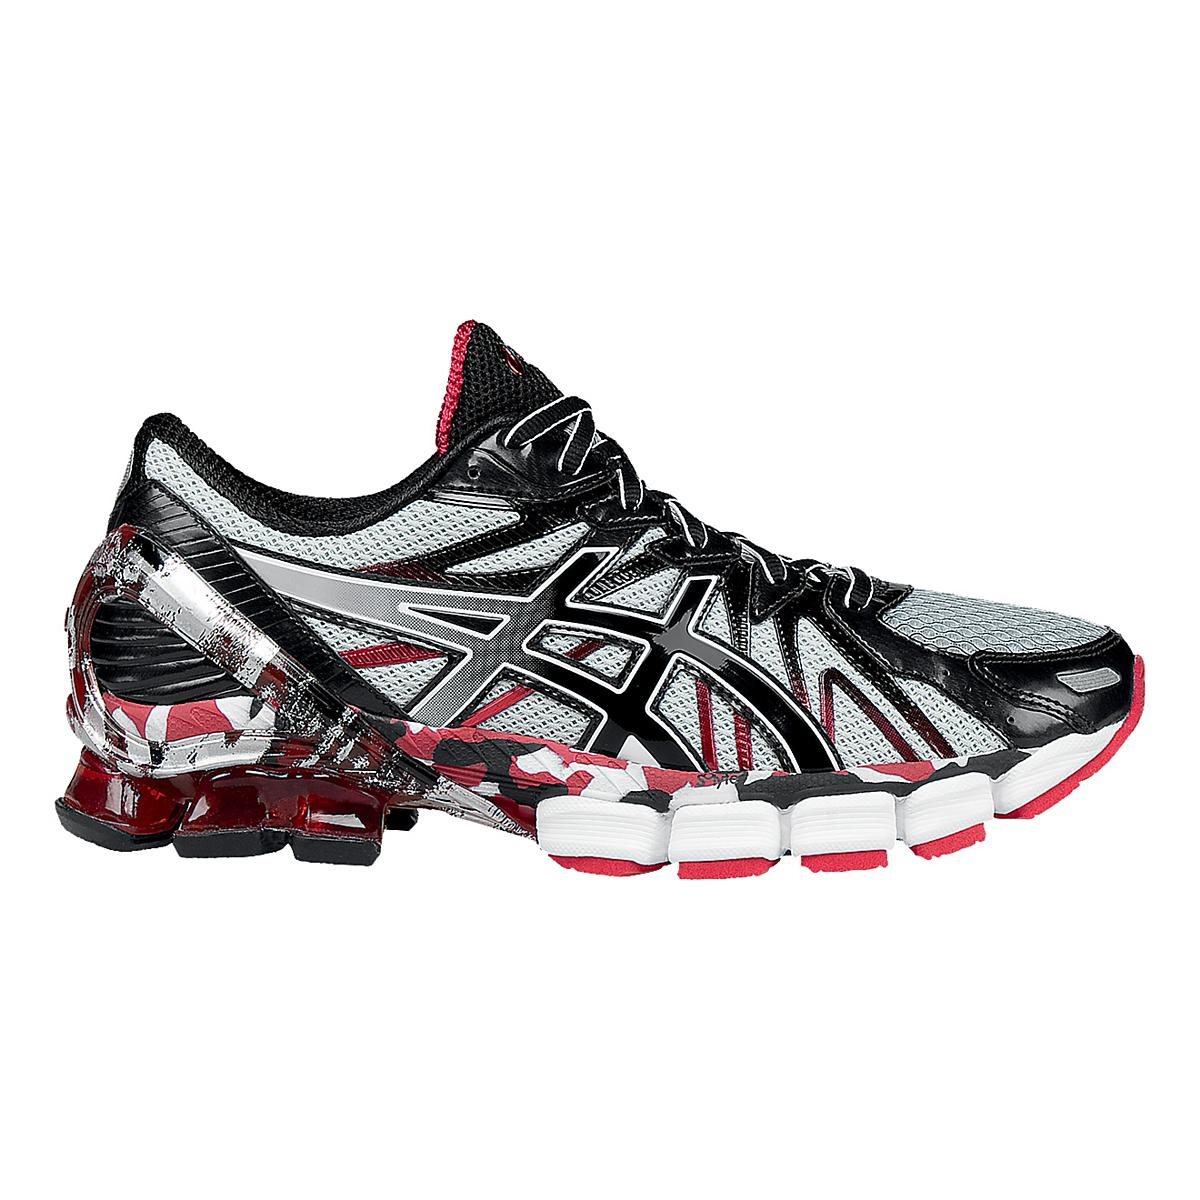 9aa56033d65d Mens ASICS GEL-Sendai 3 Running Shoe at Road Runner Sports